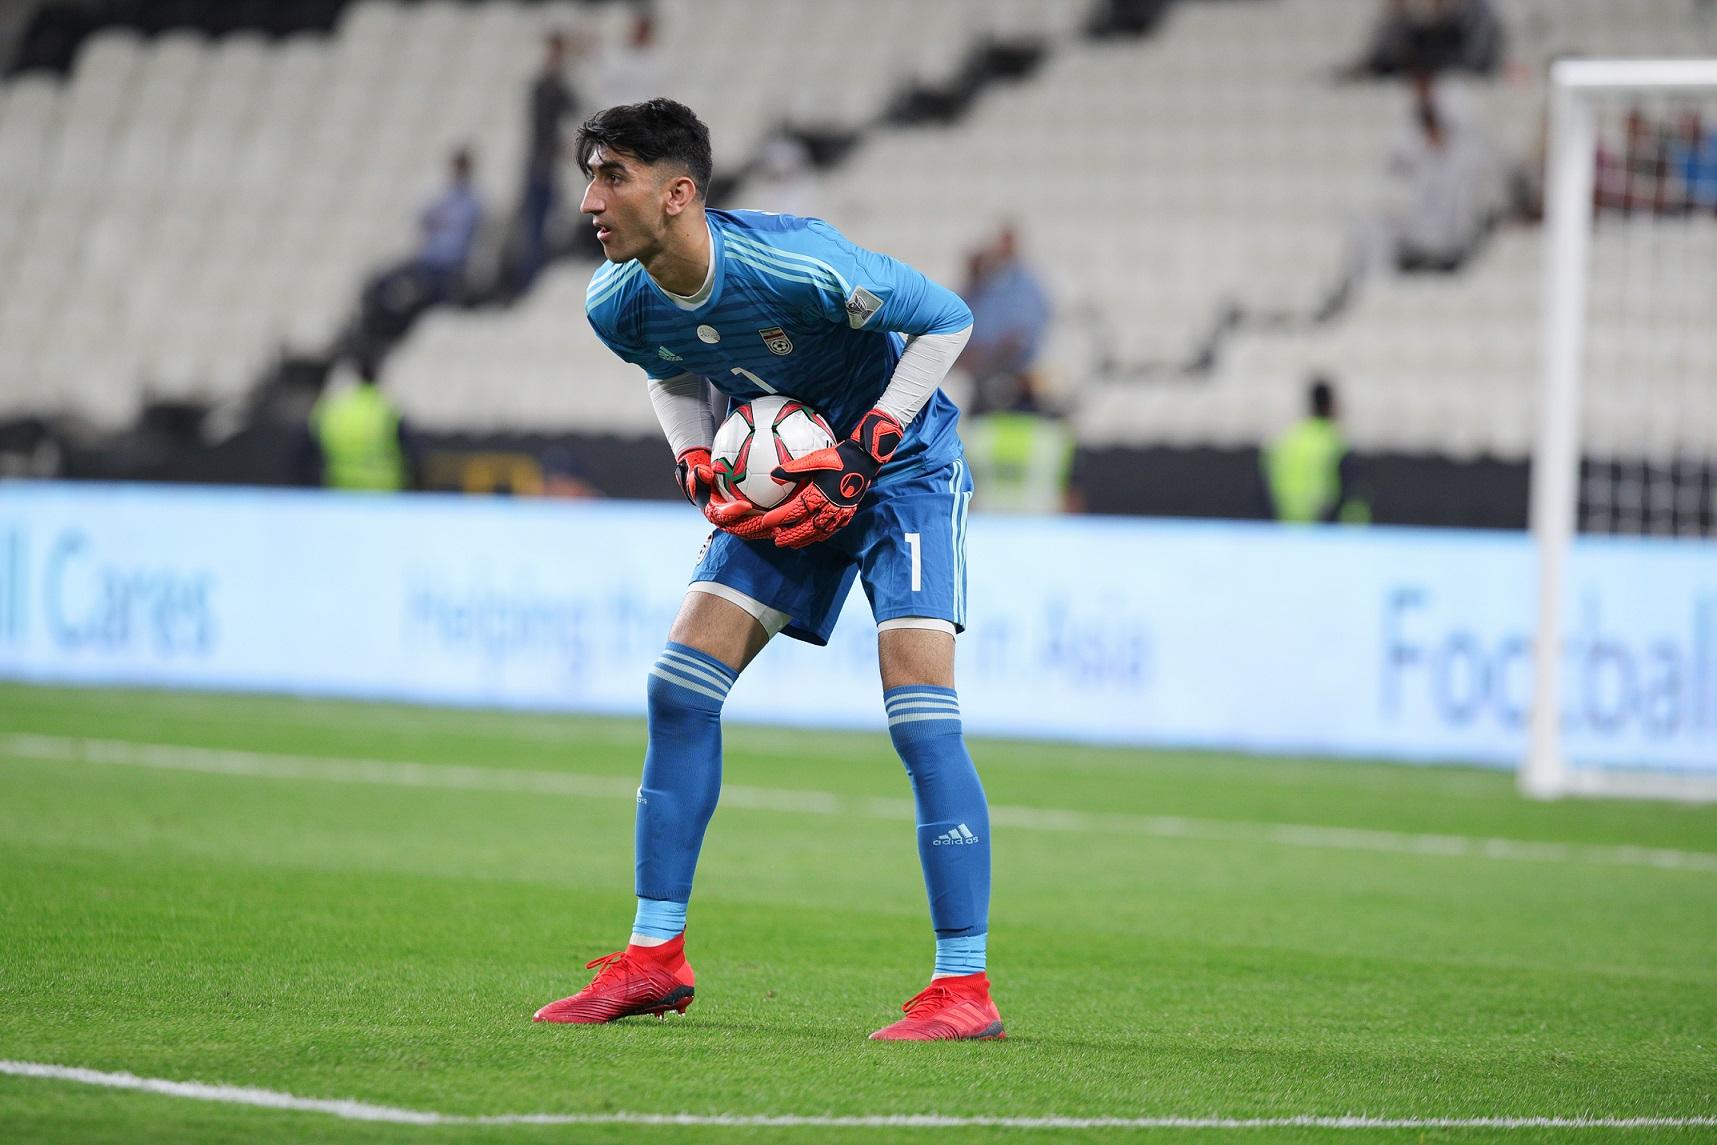 Beiranvand, didn't disappoint Queiroz (Asian Football Confederation (AFC))